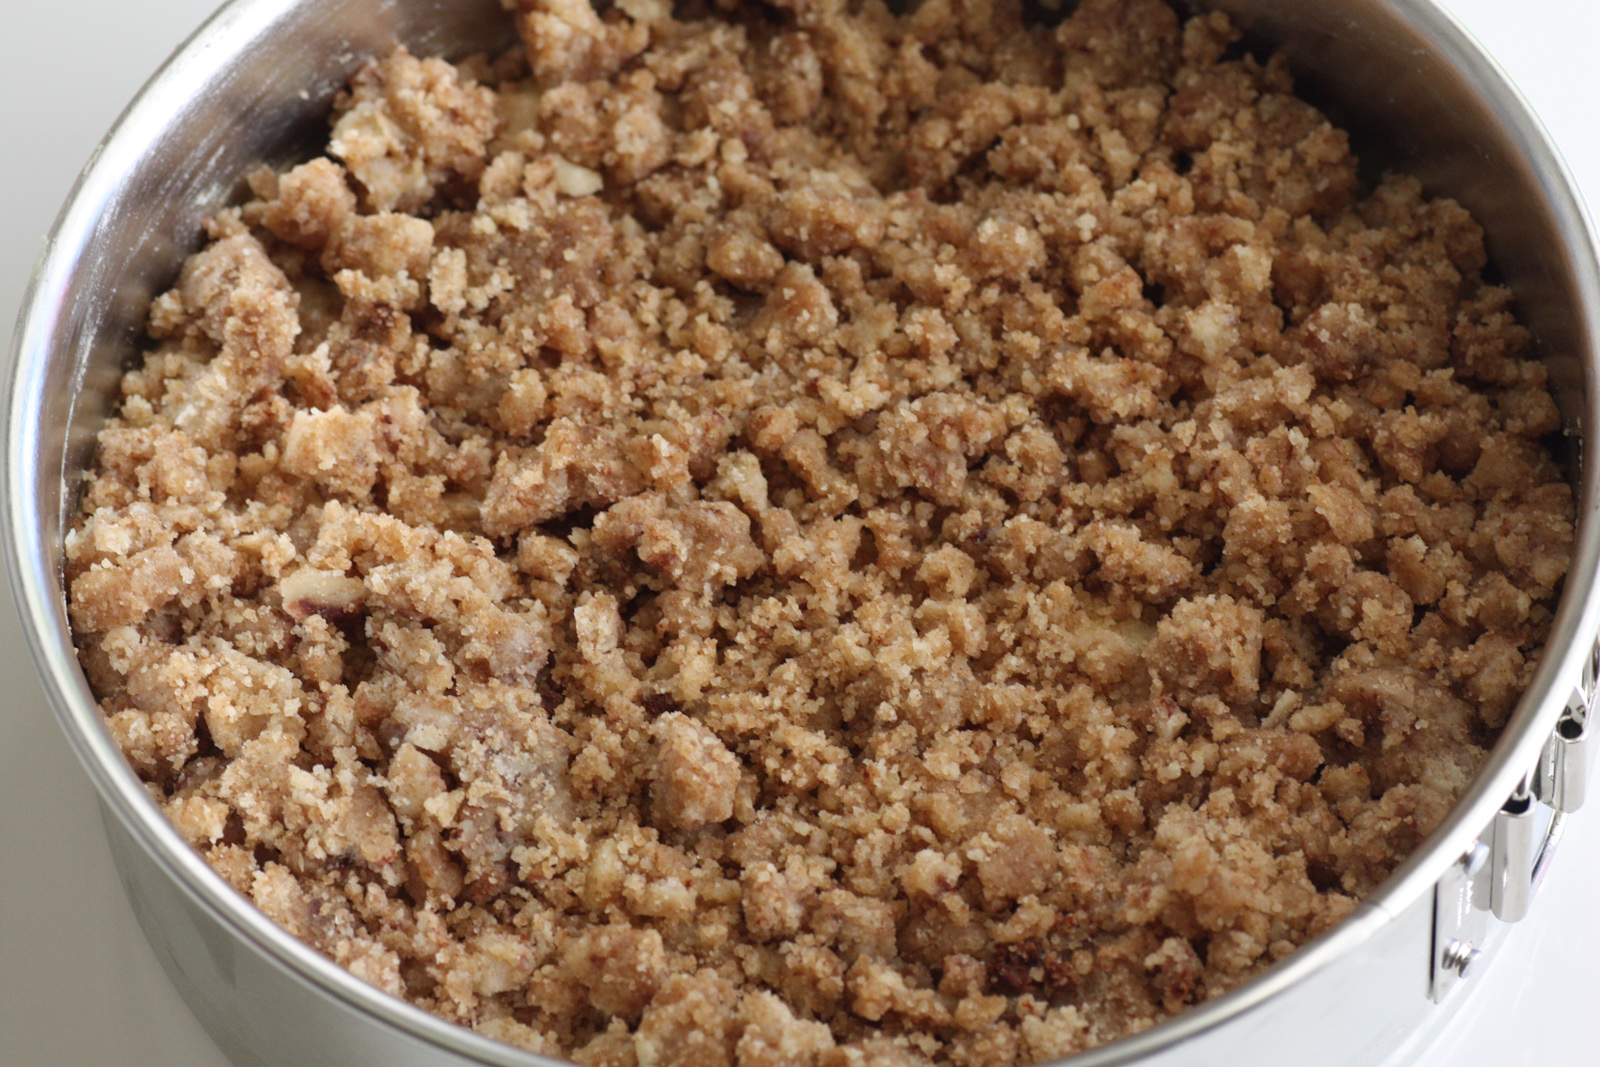 Make Apple Crumble Cake